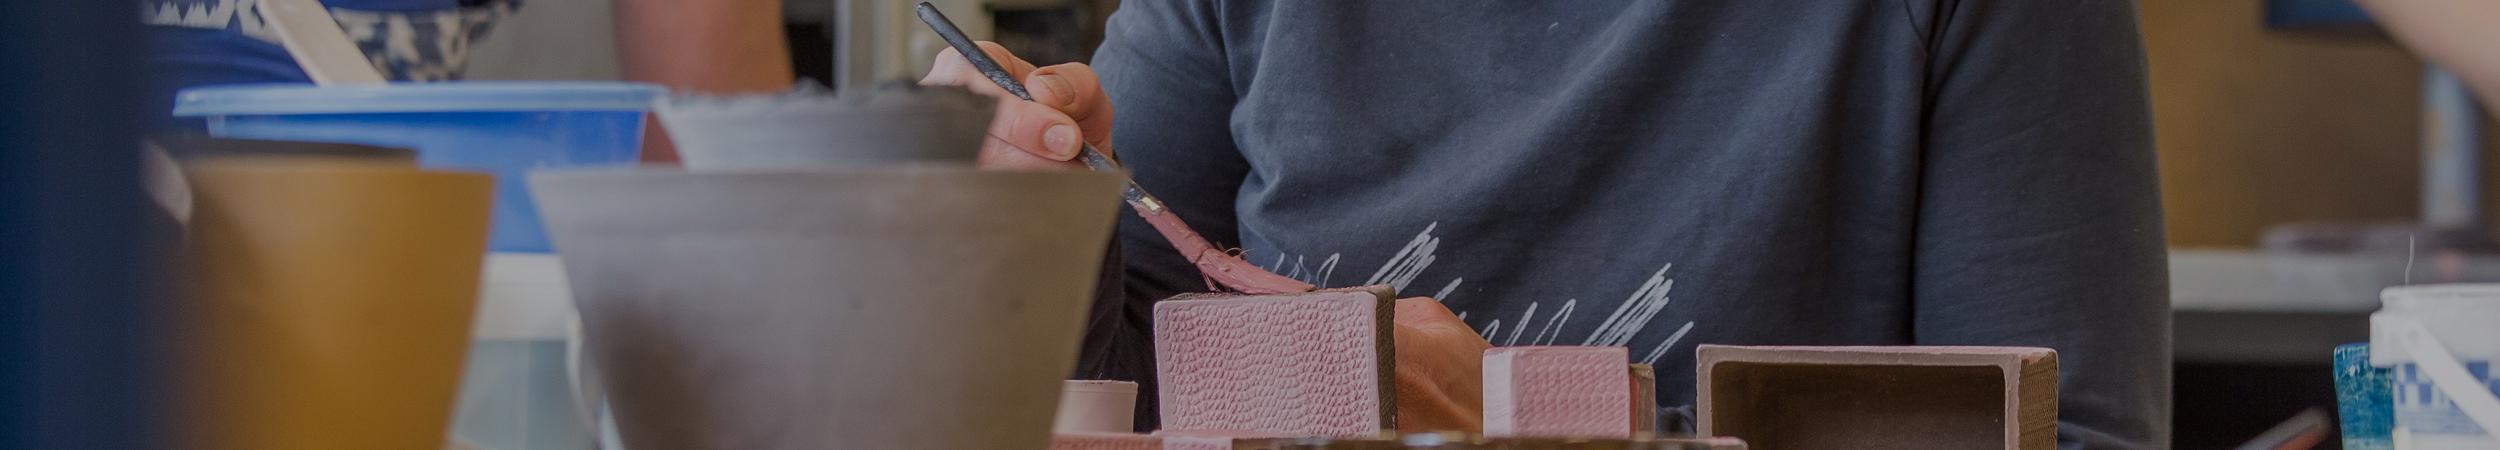 keramiek opleidingen